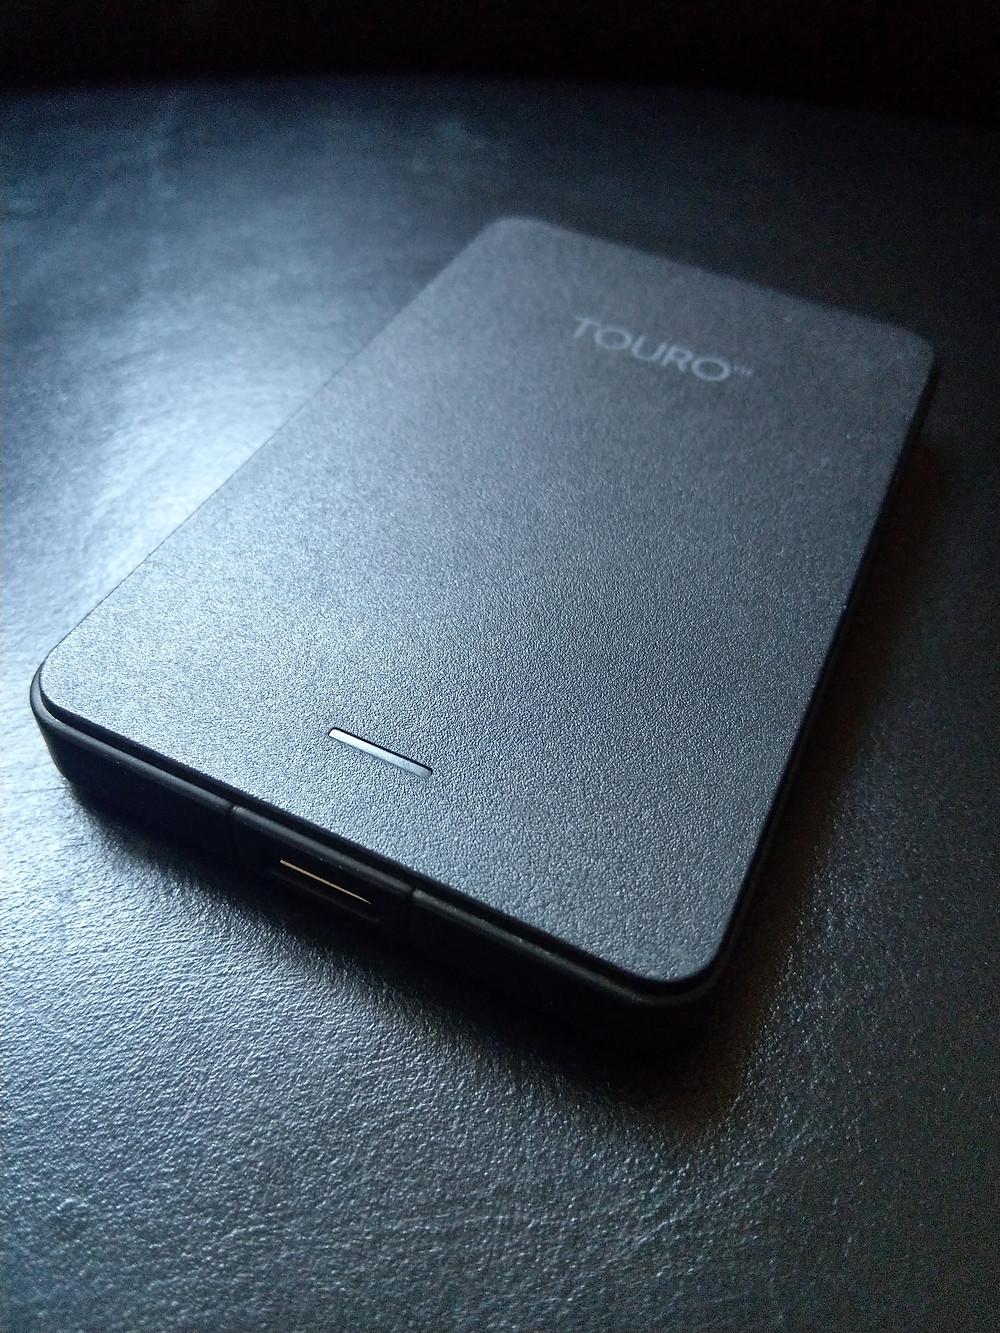 Touro USB 3.0 External Hard Disk Drive